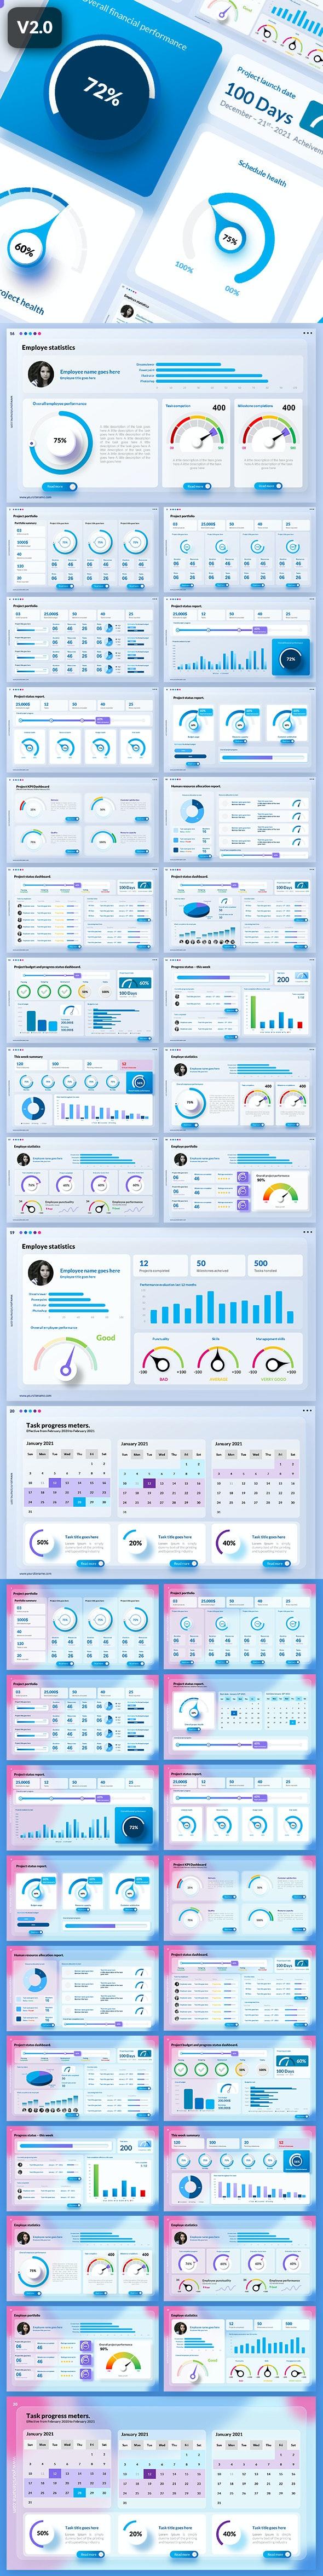 Glassmorphic Project Management Dashboard - PowerPoint Templates Presentation Templates